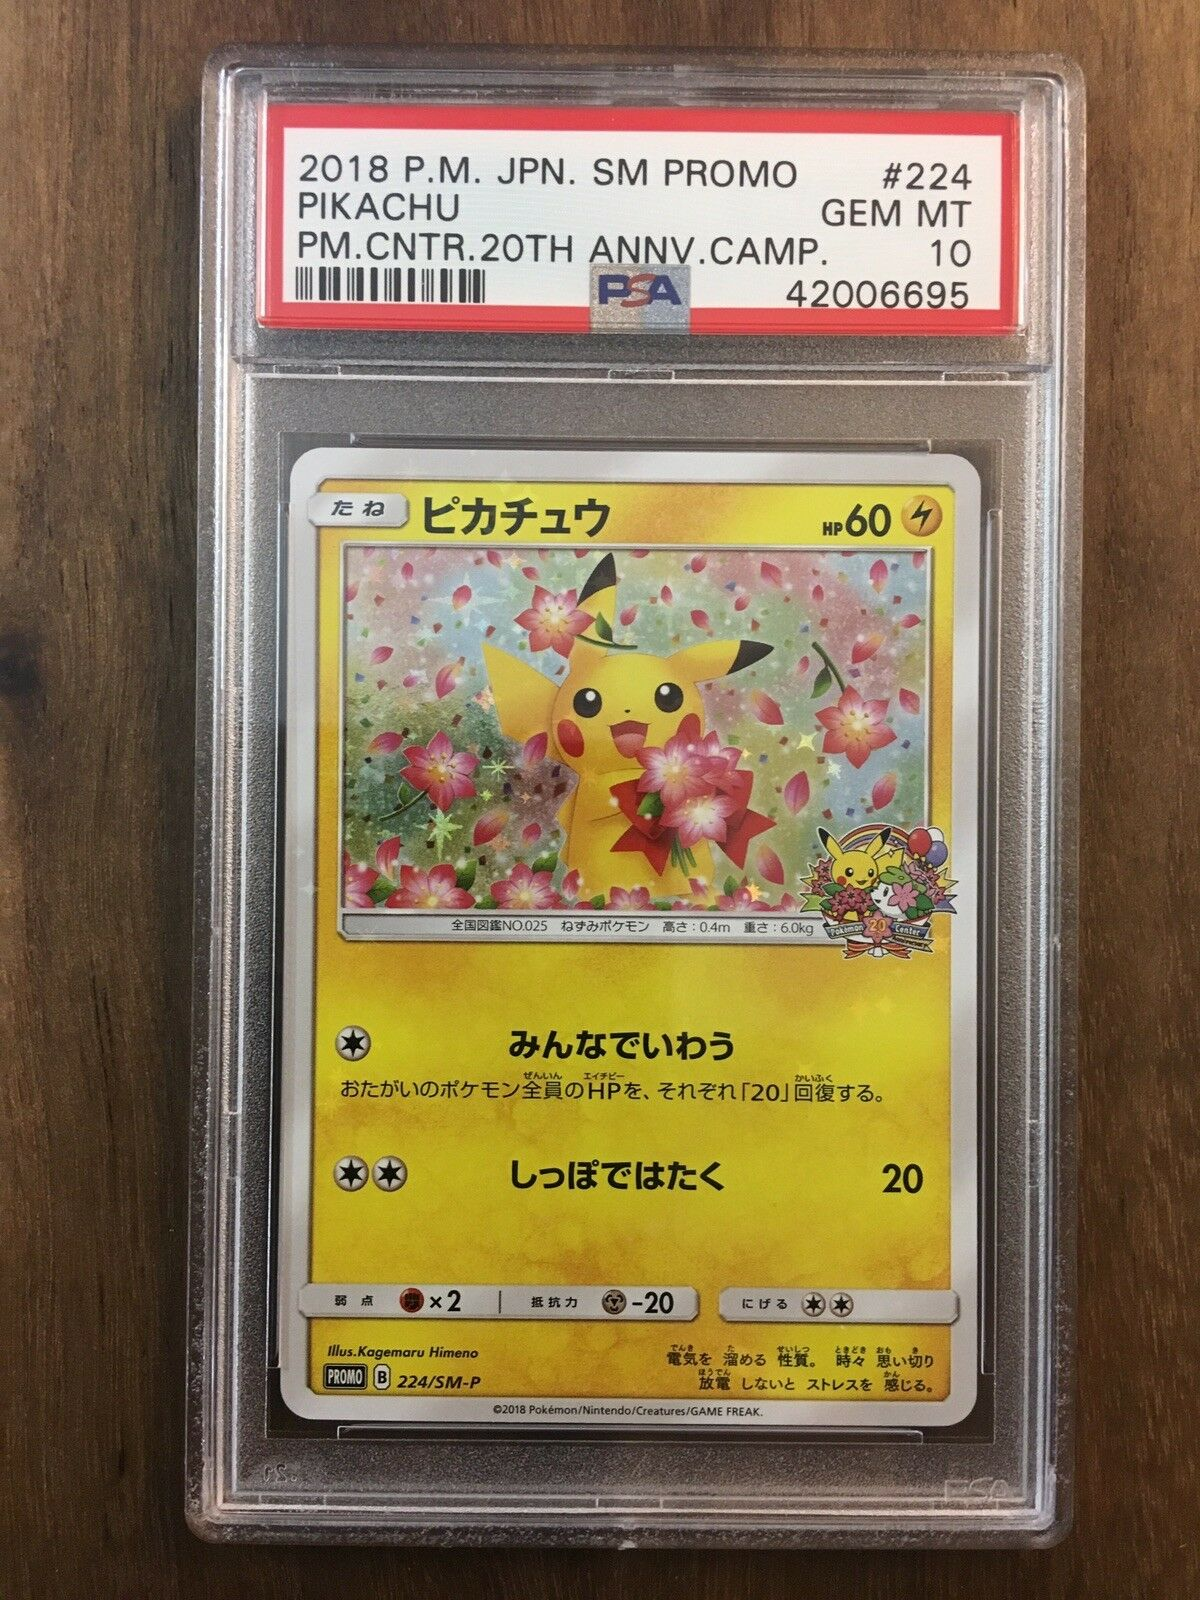 Pokémon pikachu sun & mond japanische promo - 20. jahrestag sm-p 224 psa 10 gem